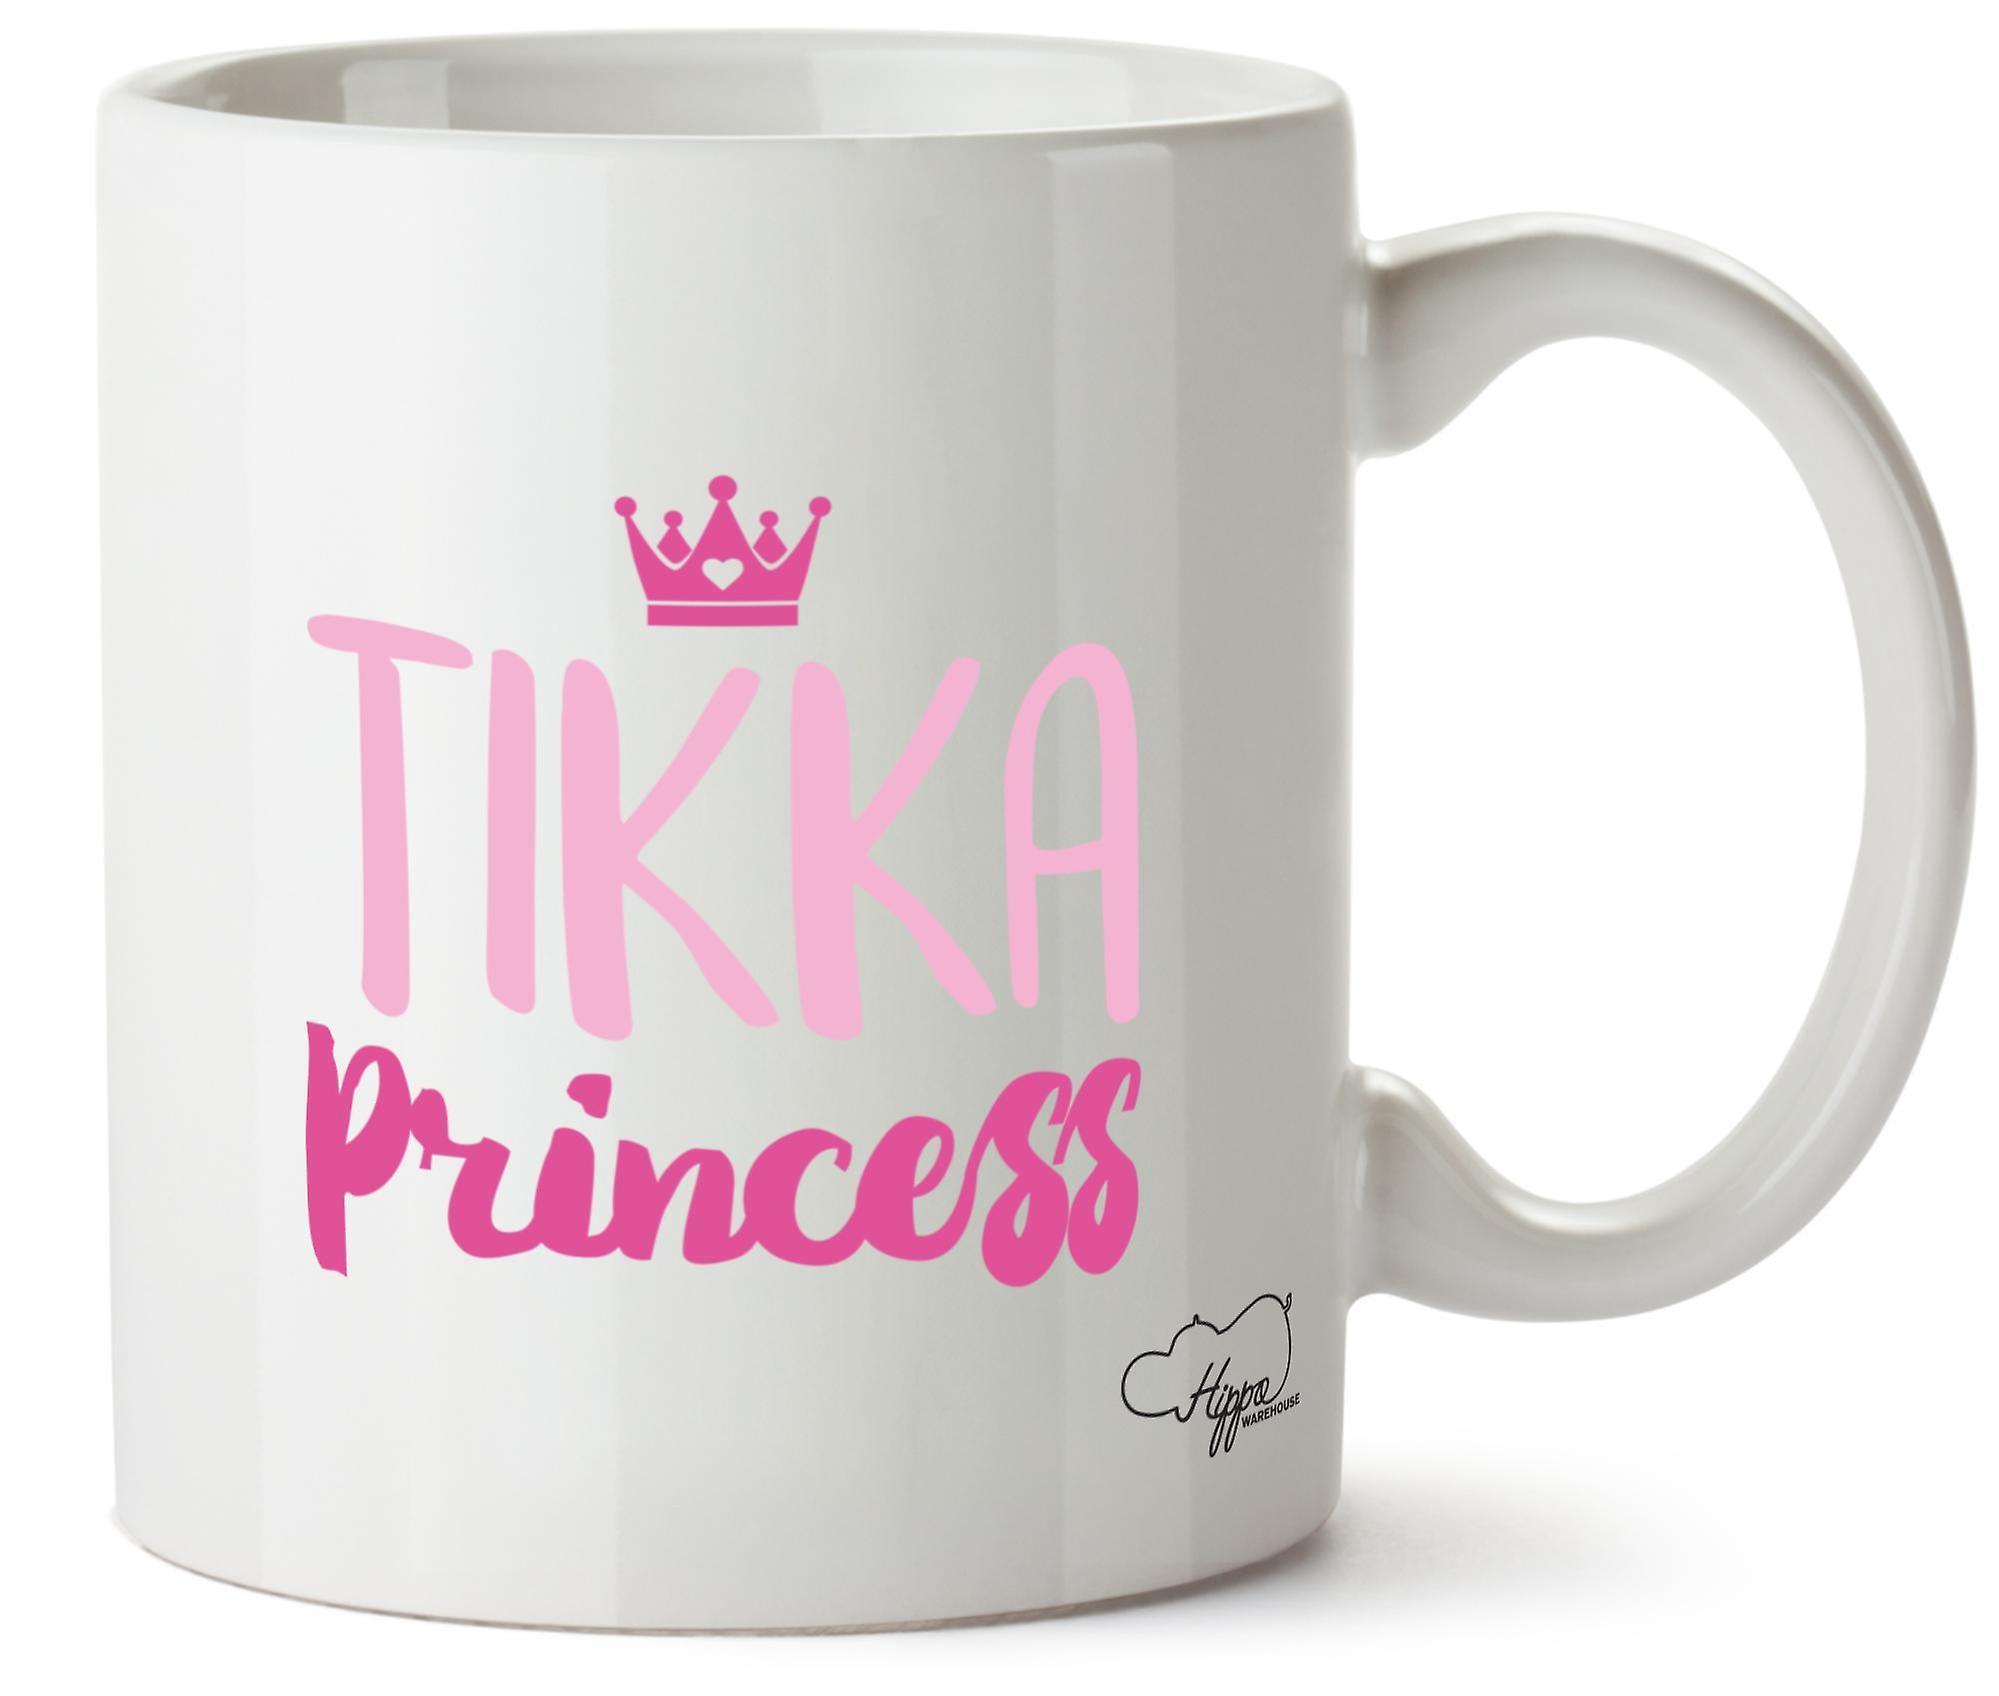 Hippowarehouse Tikka Princess Printed Mug Cup Ceramic 10oz